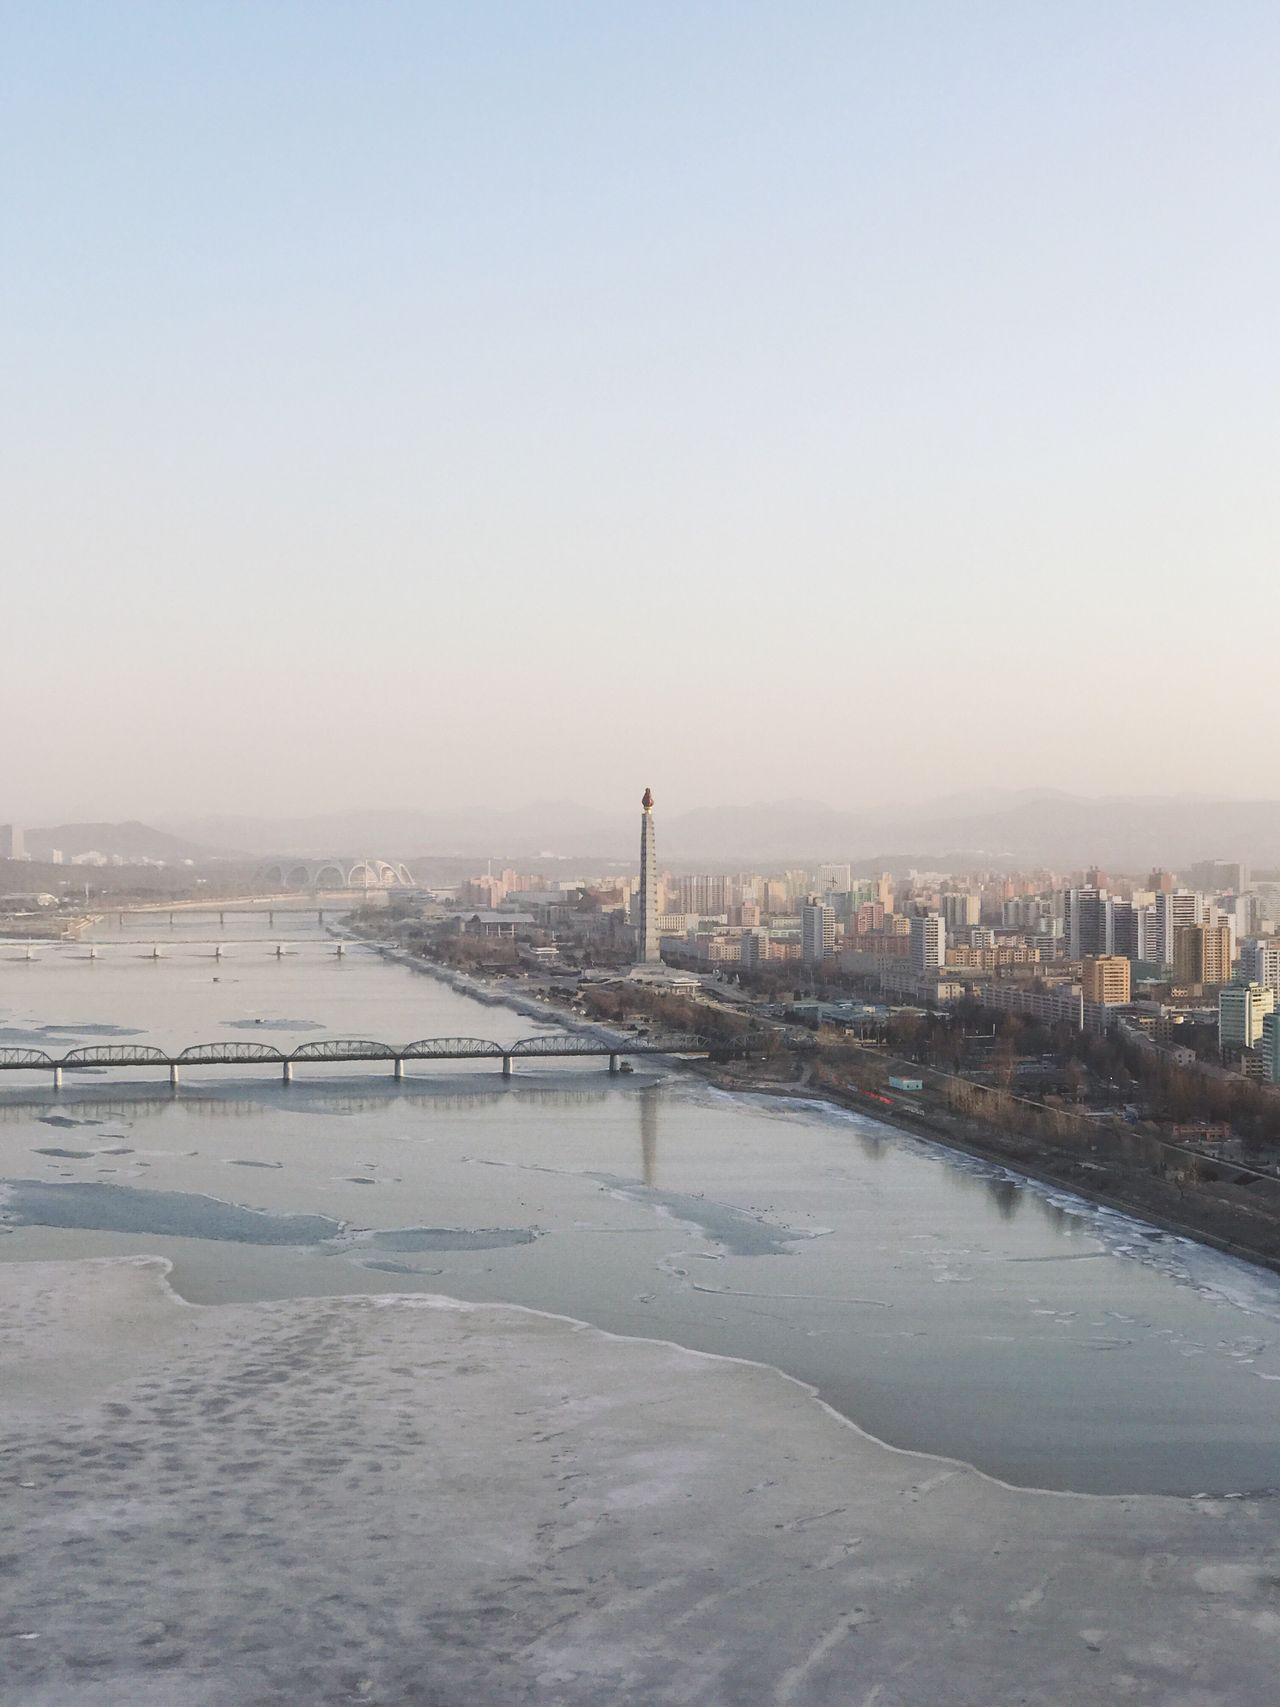 IPhone IPhoneography IPhone7Plus Iphoneonly Iphonesia Iphonephotography IPhone Photography ShotOnIphone Shotoniphone7 Shotoniphone7plus City North Korea Northkorea DPRK Pyongyang